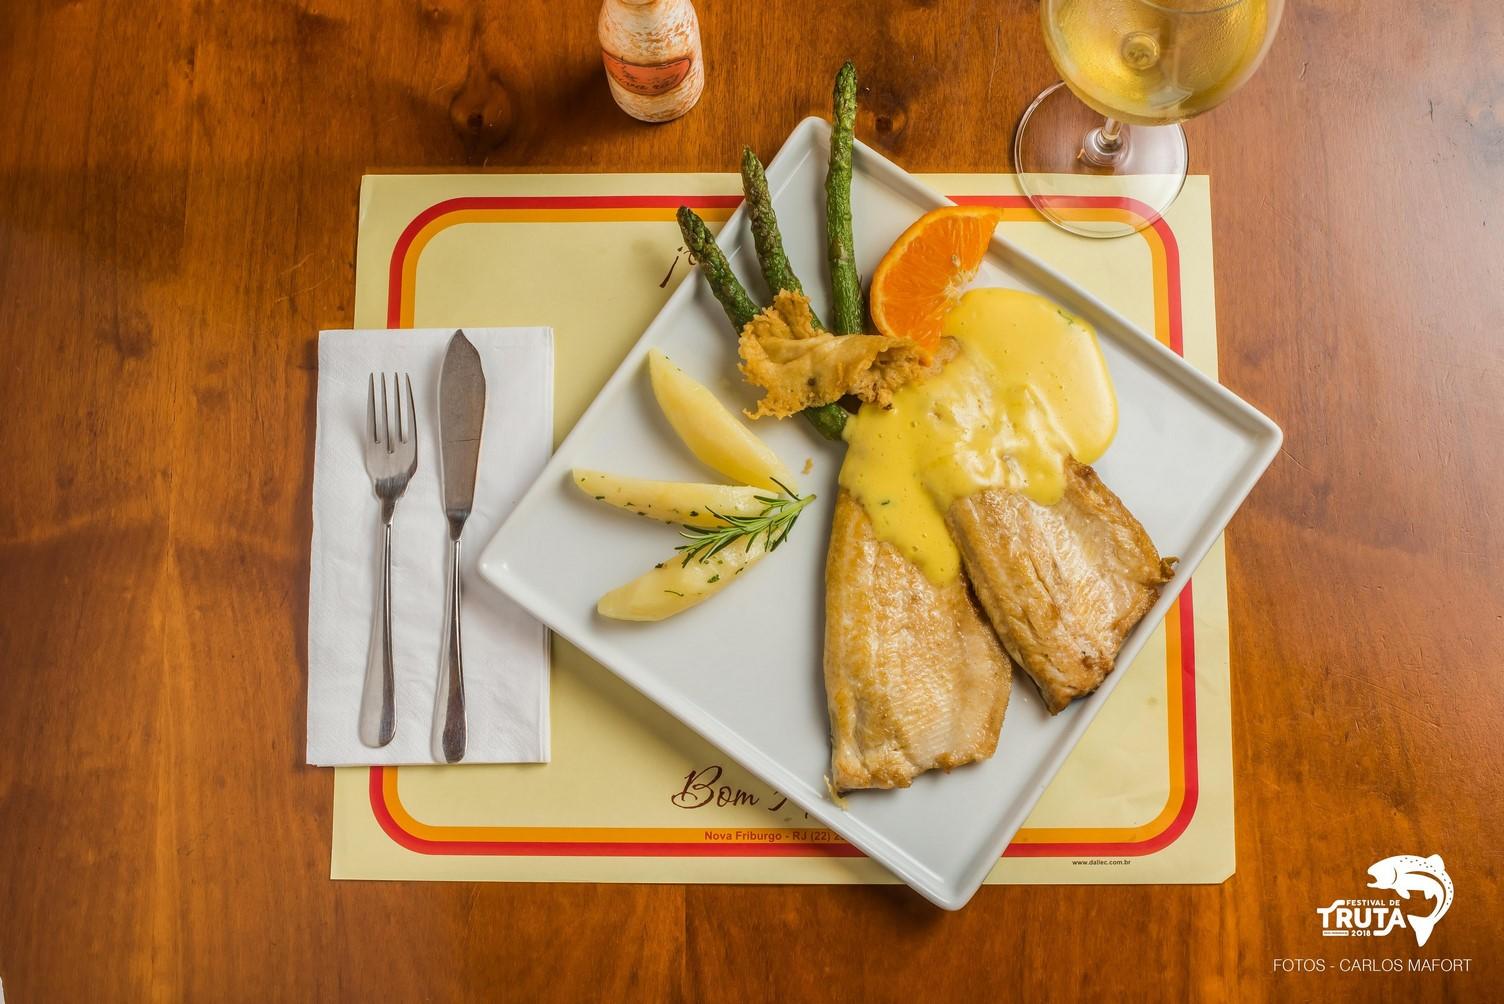 A truta do Viva Rô: melhor prato técnico (Foto: Carlos Mafort)